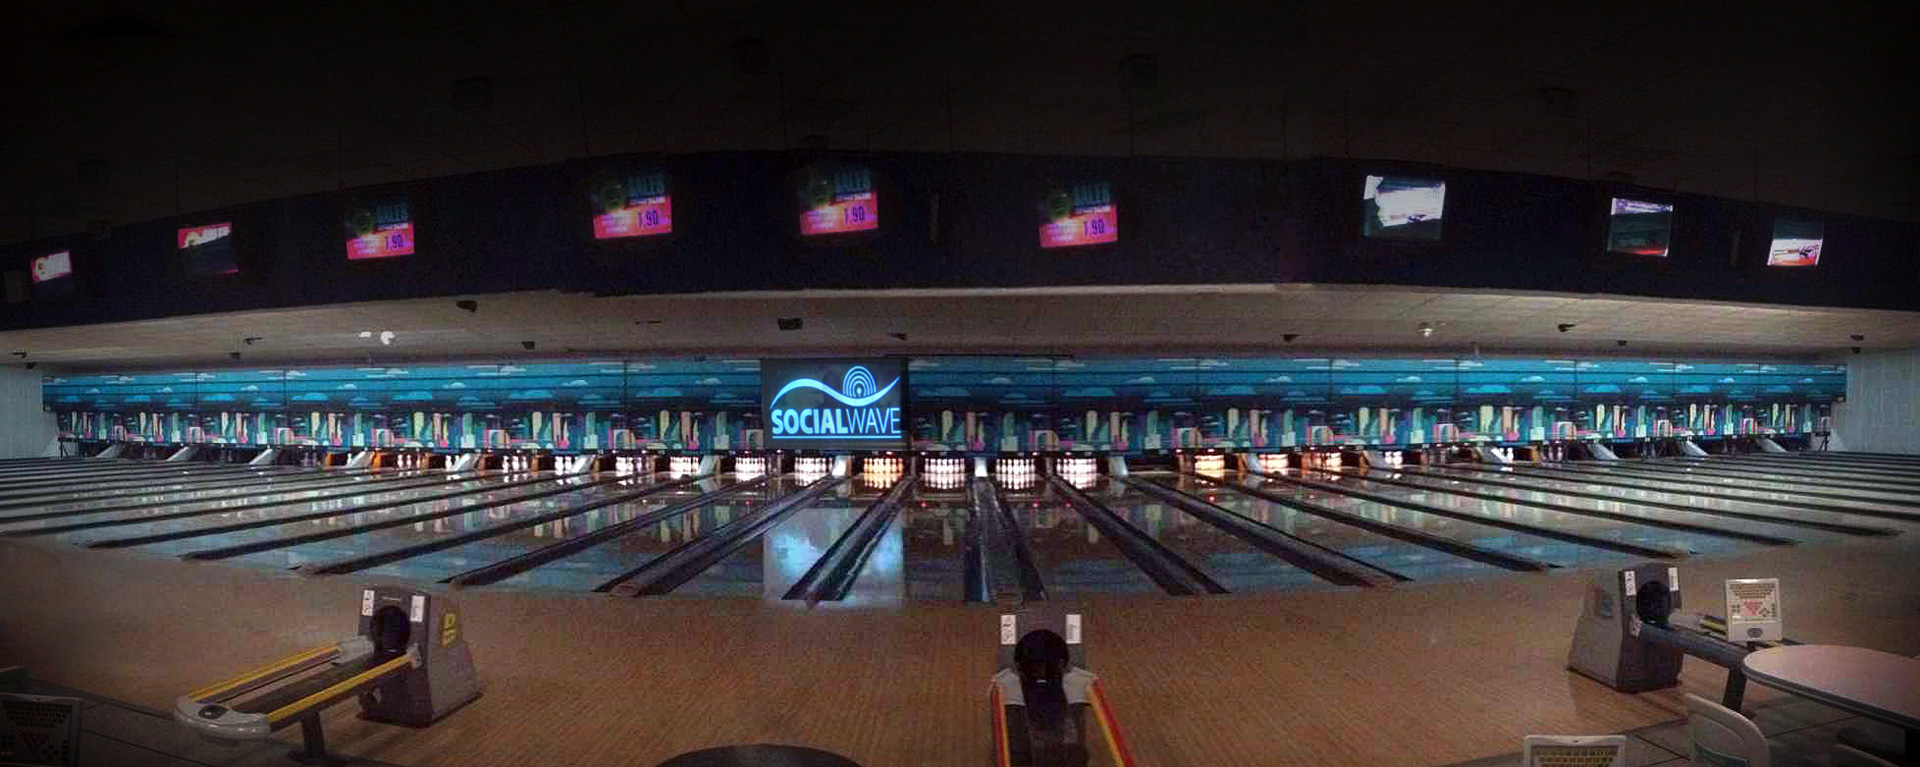 hannover bowling world